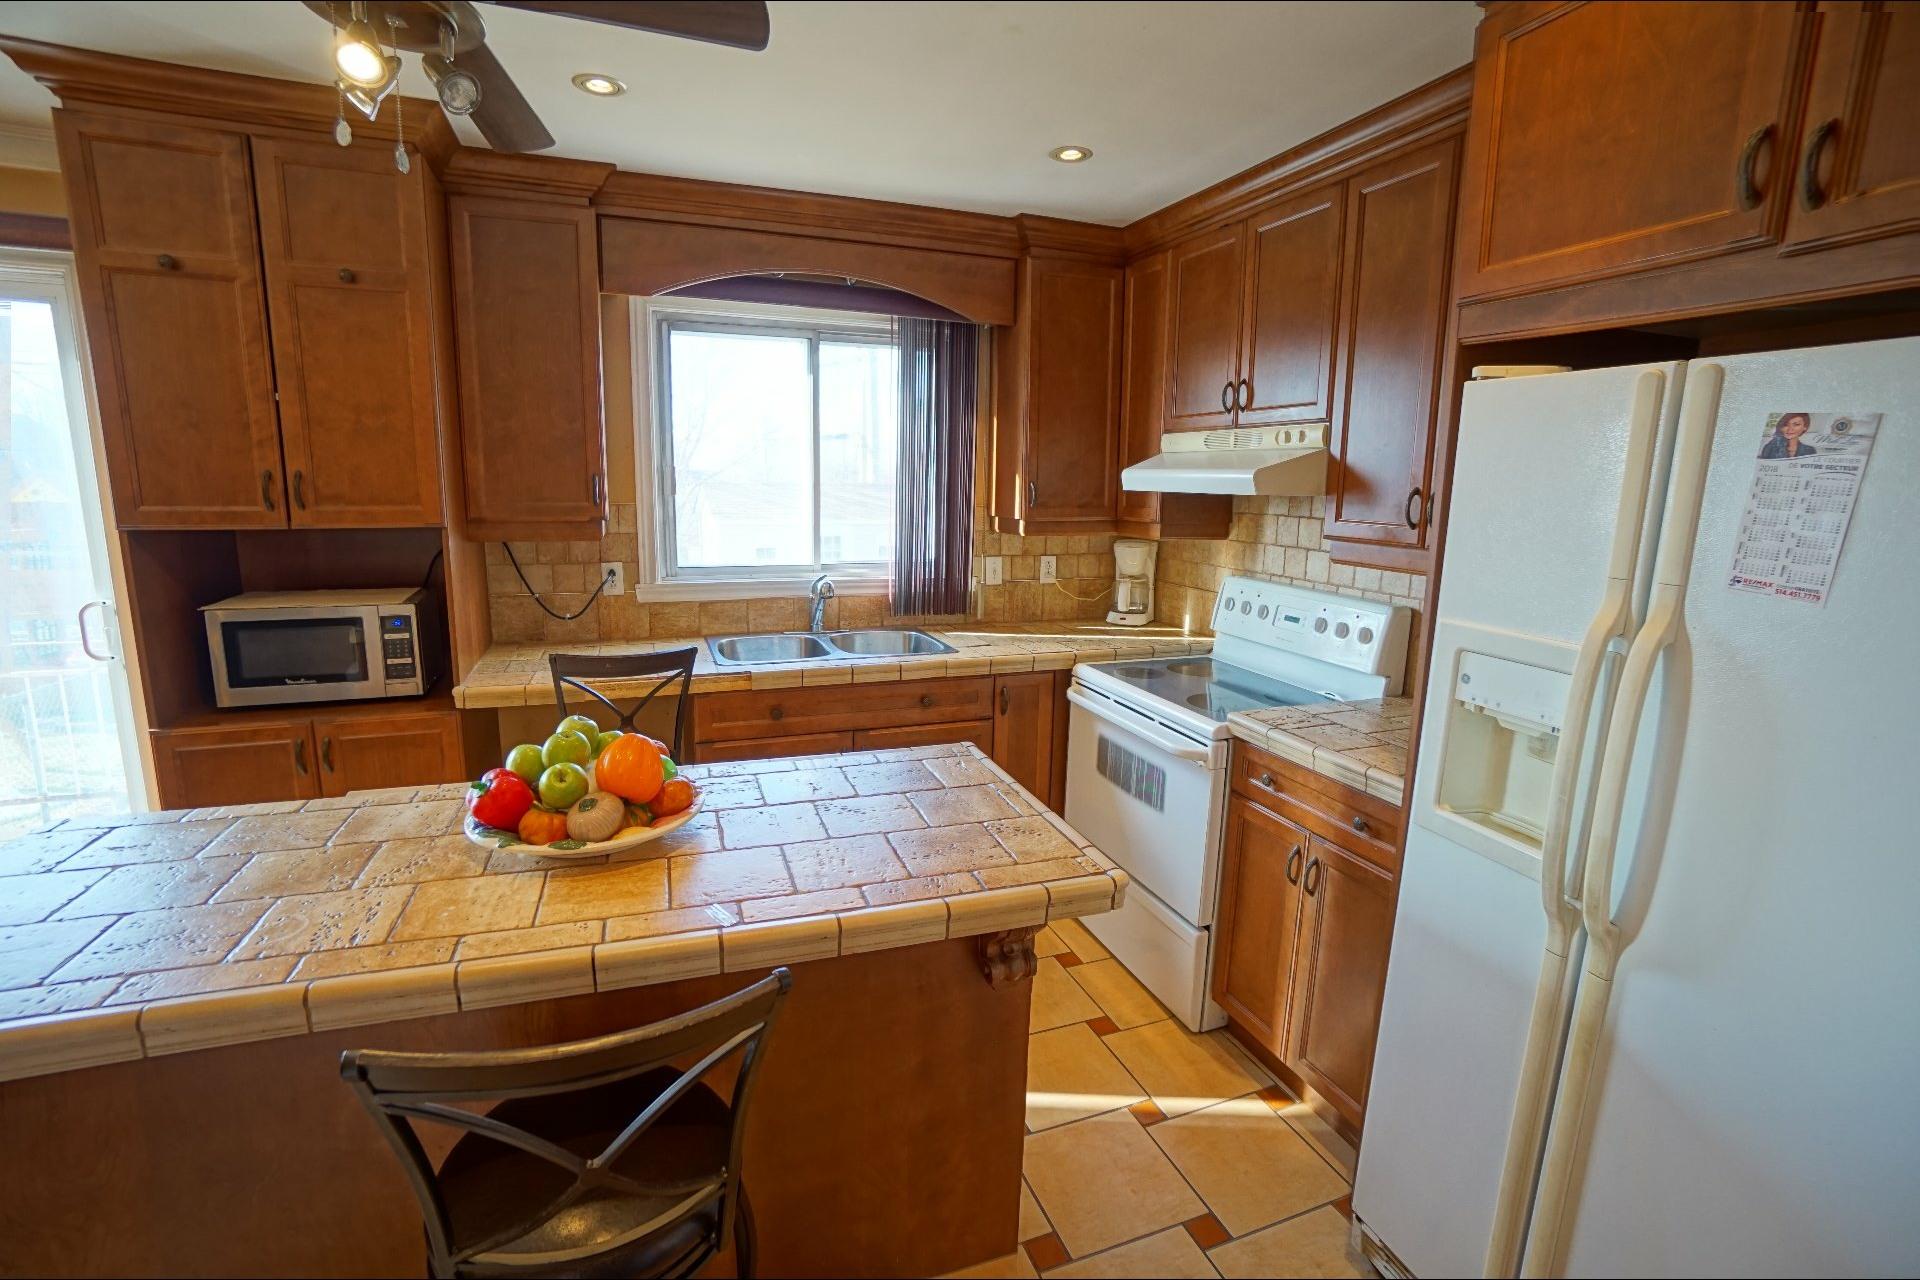 House For Sale Montreal Riviere Des Prairies Pointe Aux